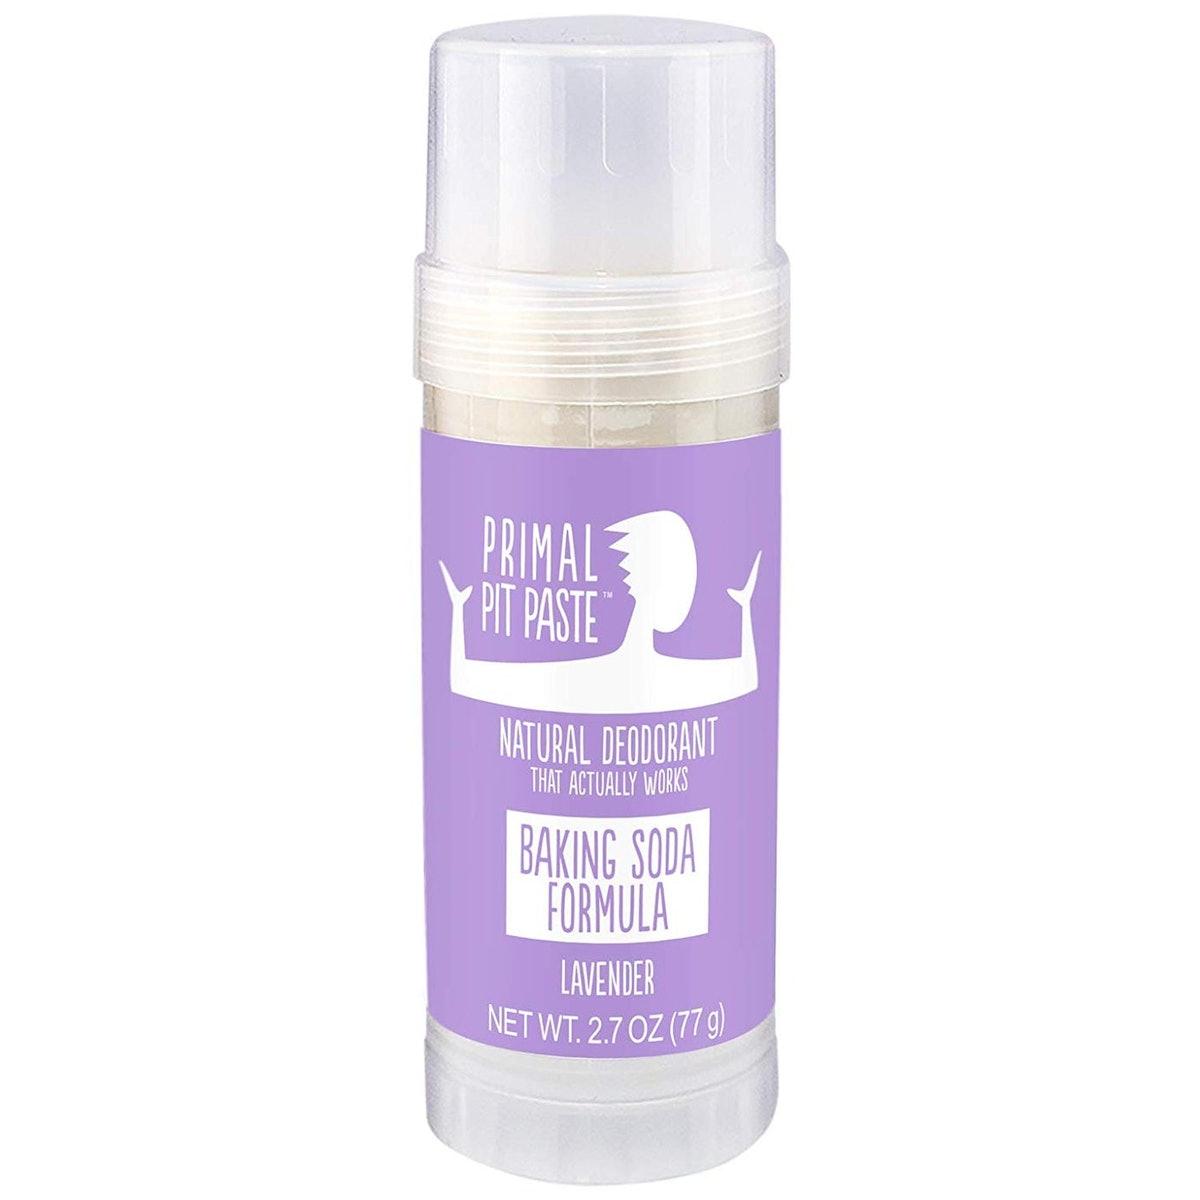 Primal Pit Paste All-Natural Deodorant